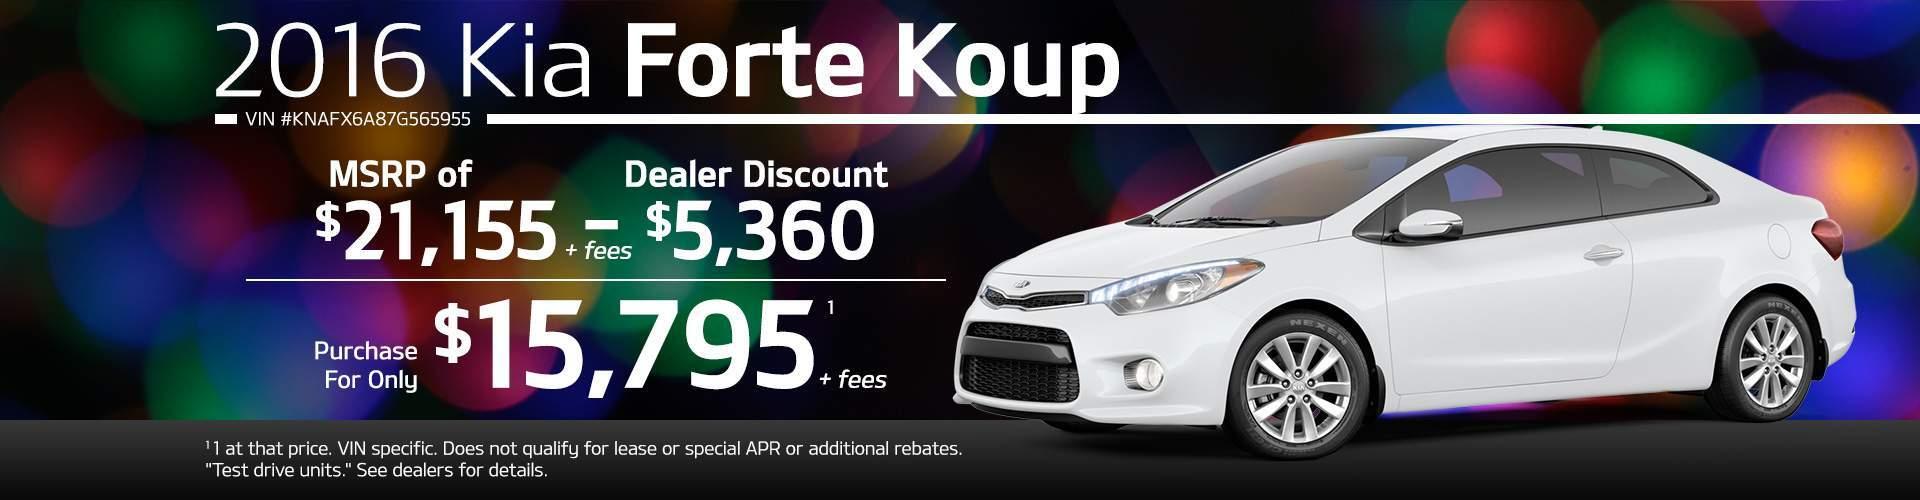 2016 Kia Forte Koup EX